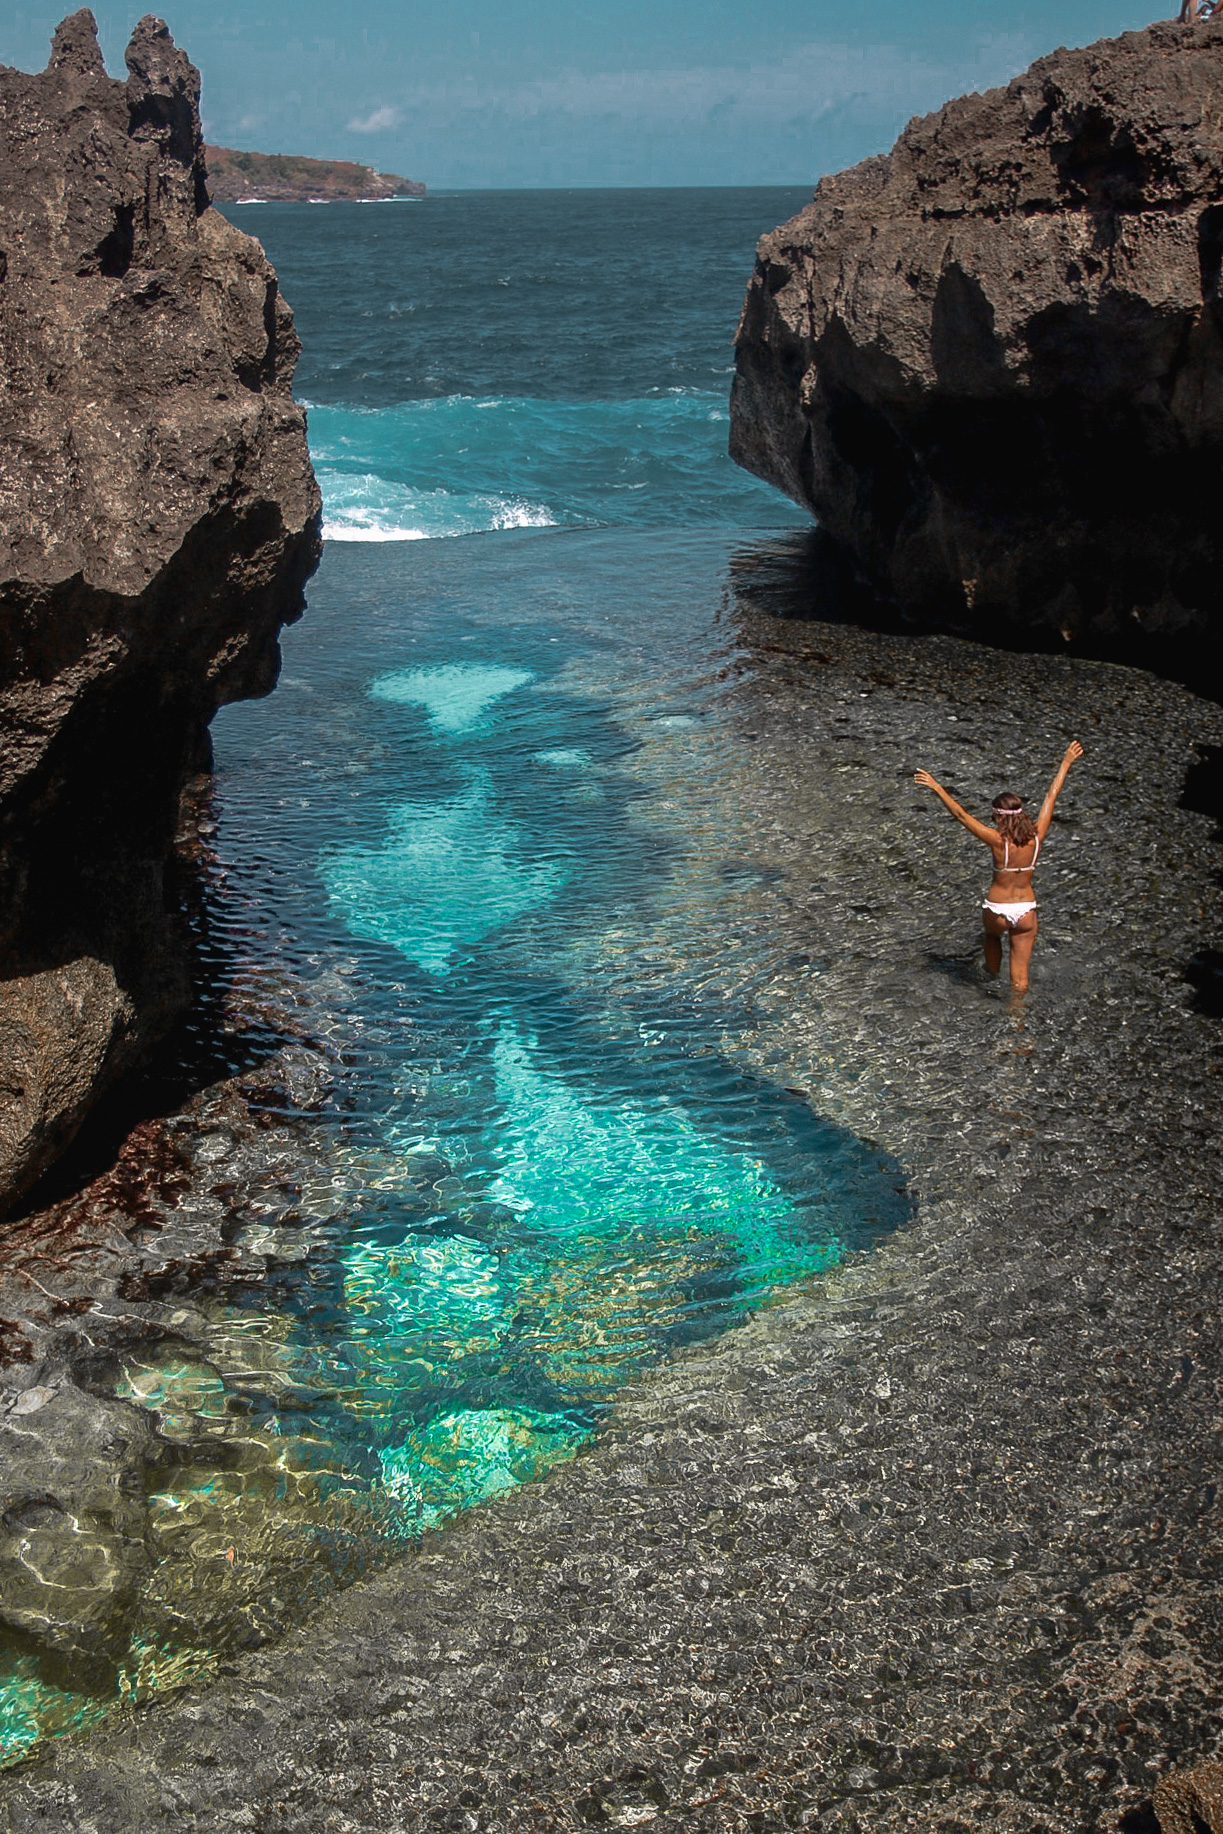 Bali - Nusa Penida Island